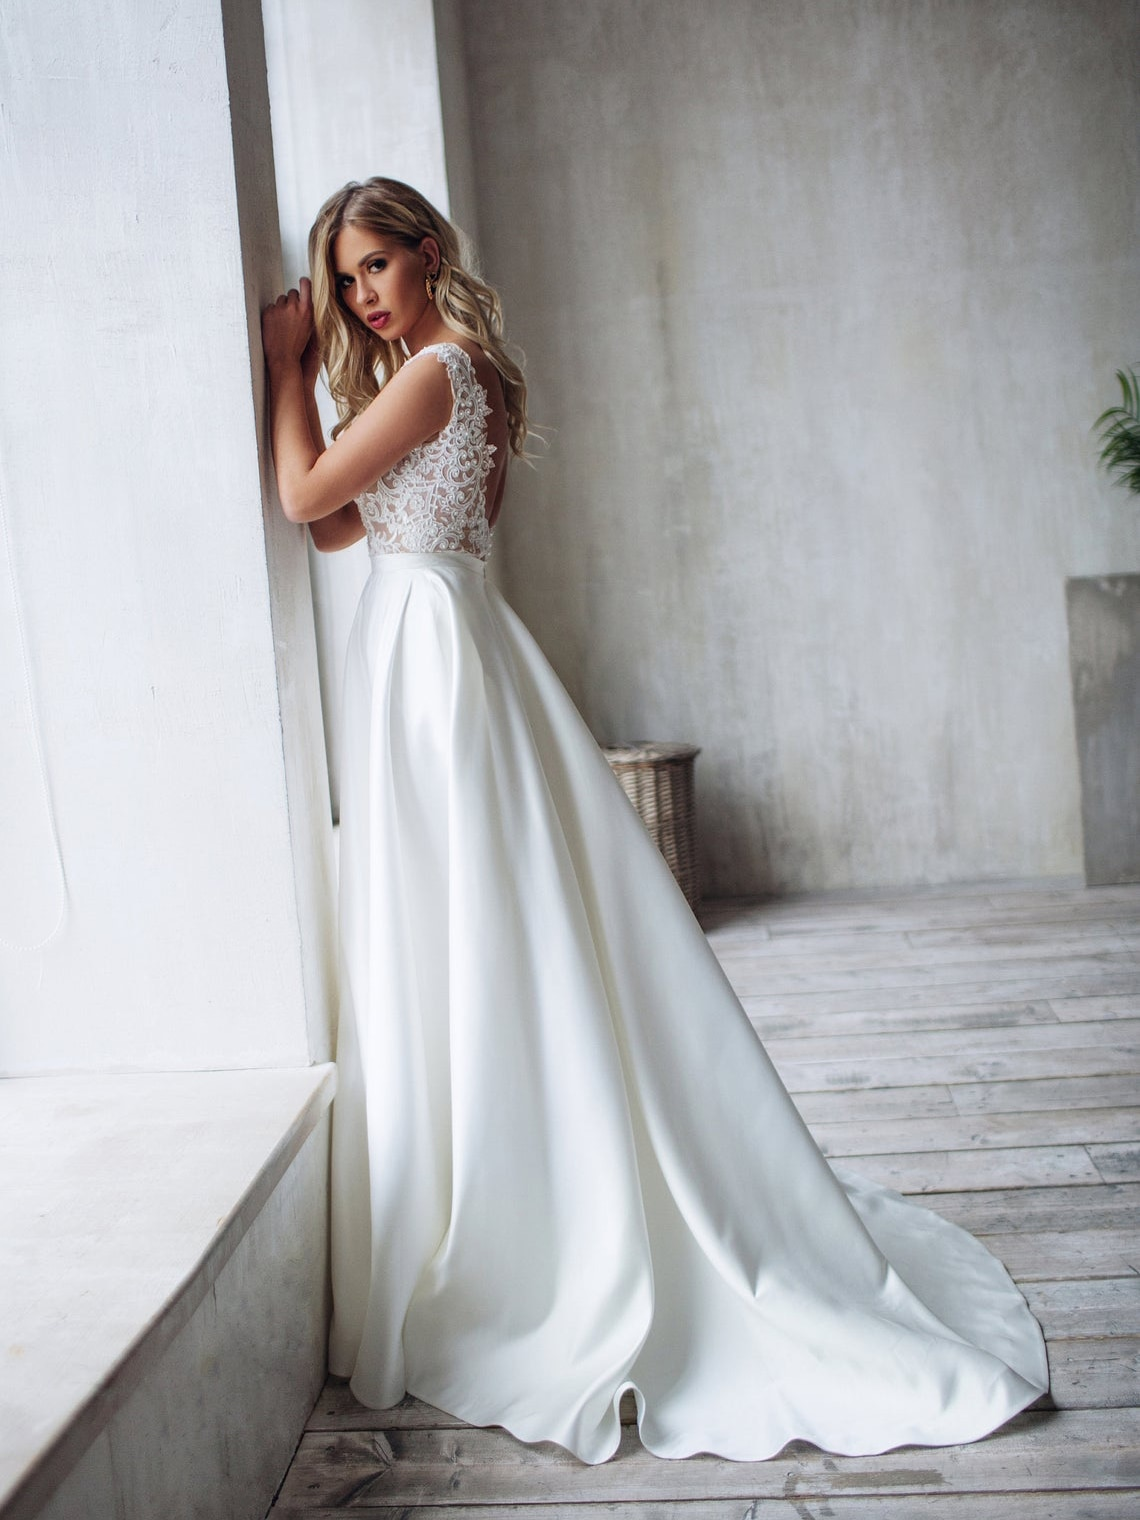 elegant-romantic-lace-outdoor-wedding-dress-v-neck-a-line-satin-bridal-gown-with-pearls-open-back-plus-size-vestido-de-noiva